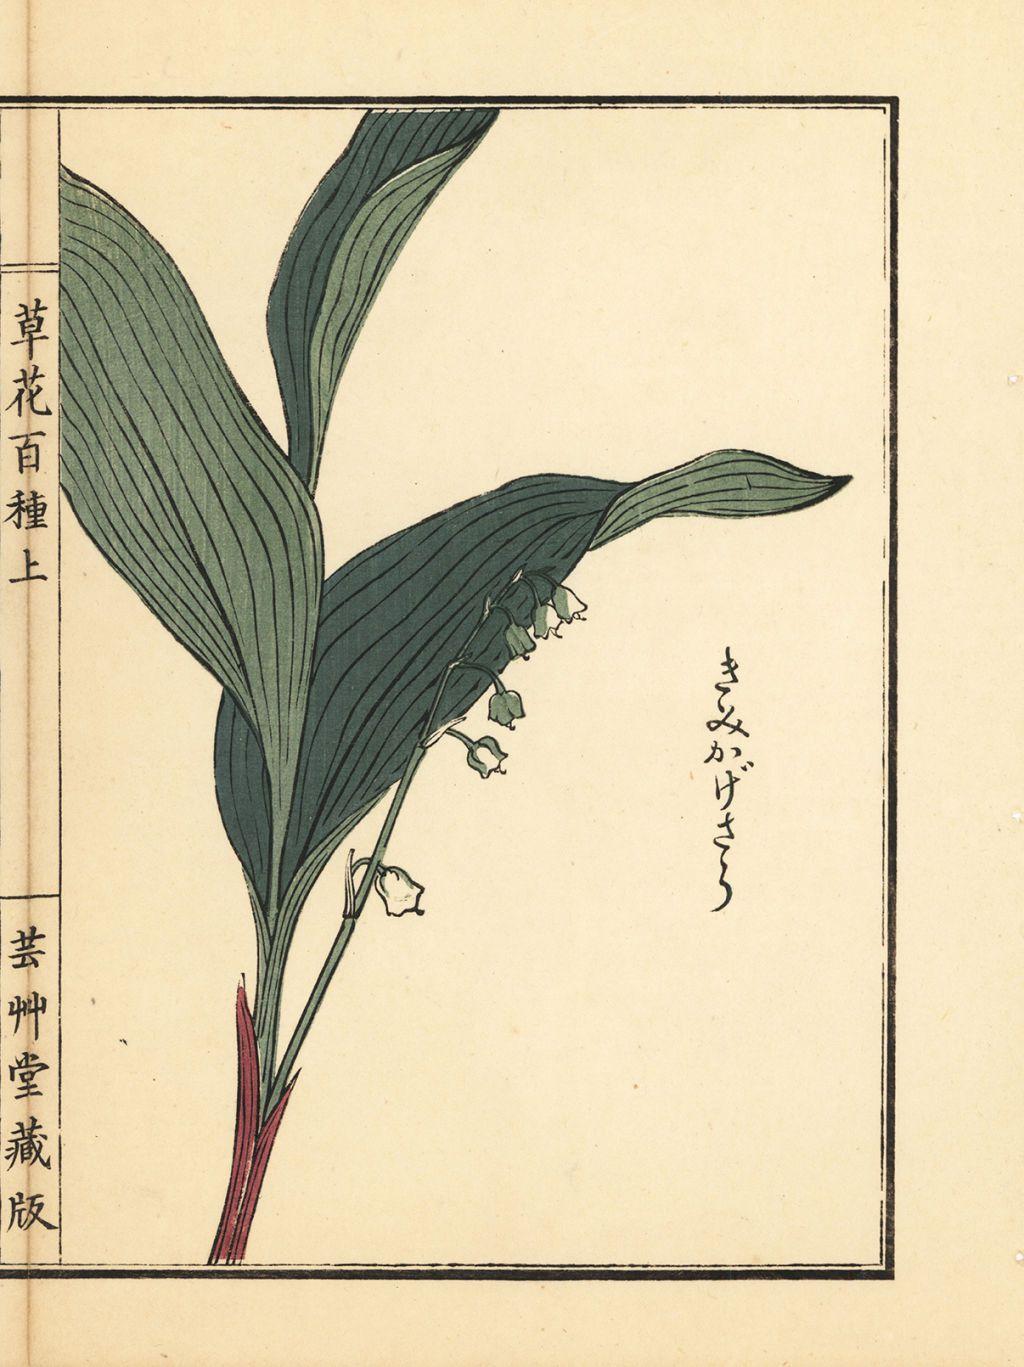 Hanakotoba May Your New Favorite Hobby Lily of